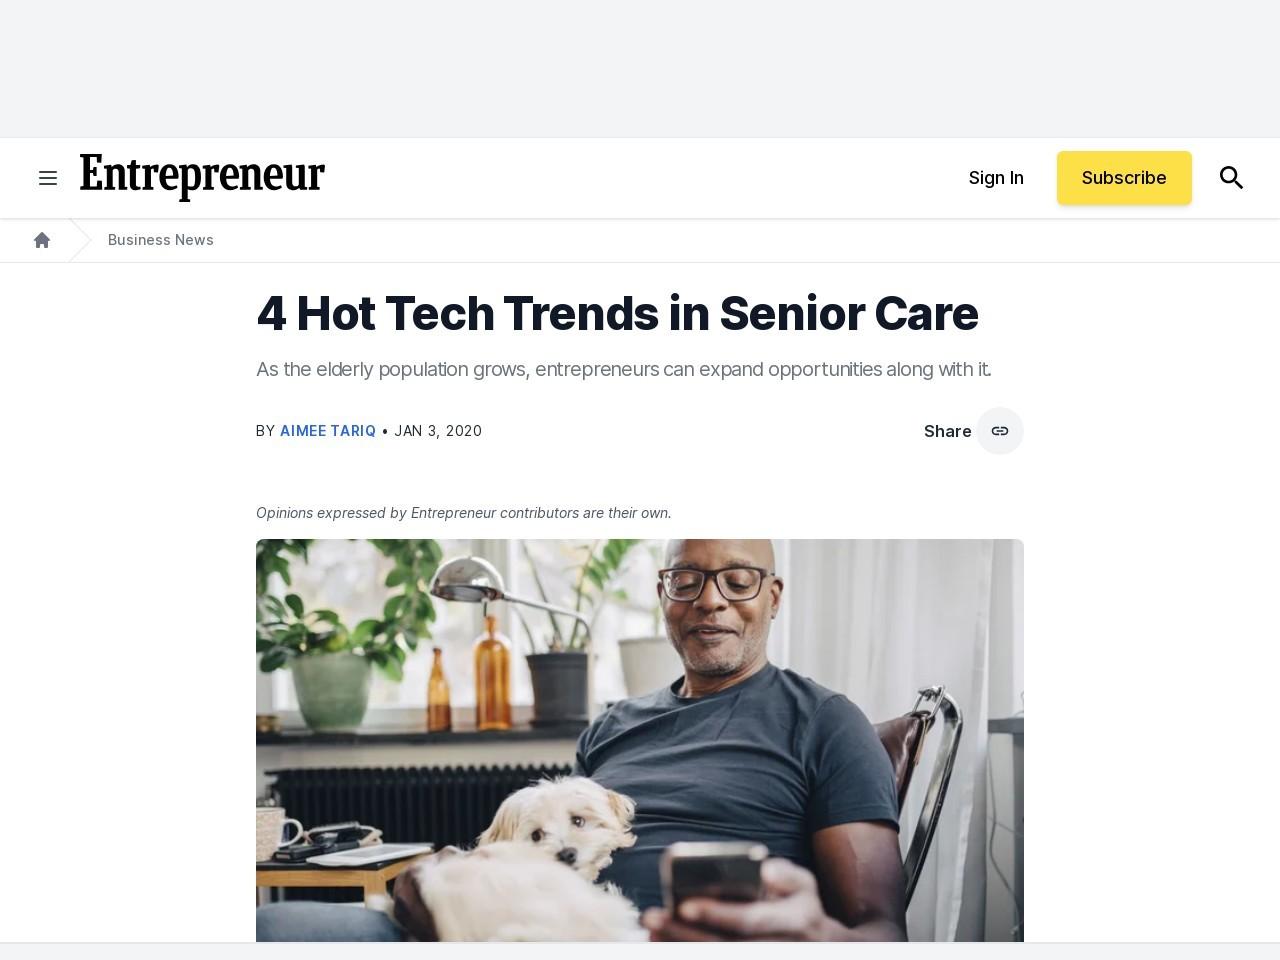 4 Hot Tech Trends in Senior Care